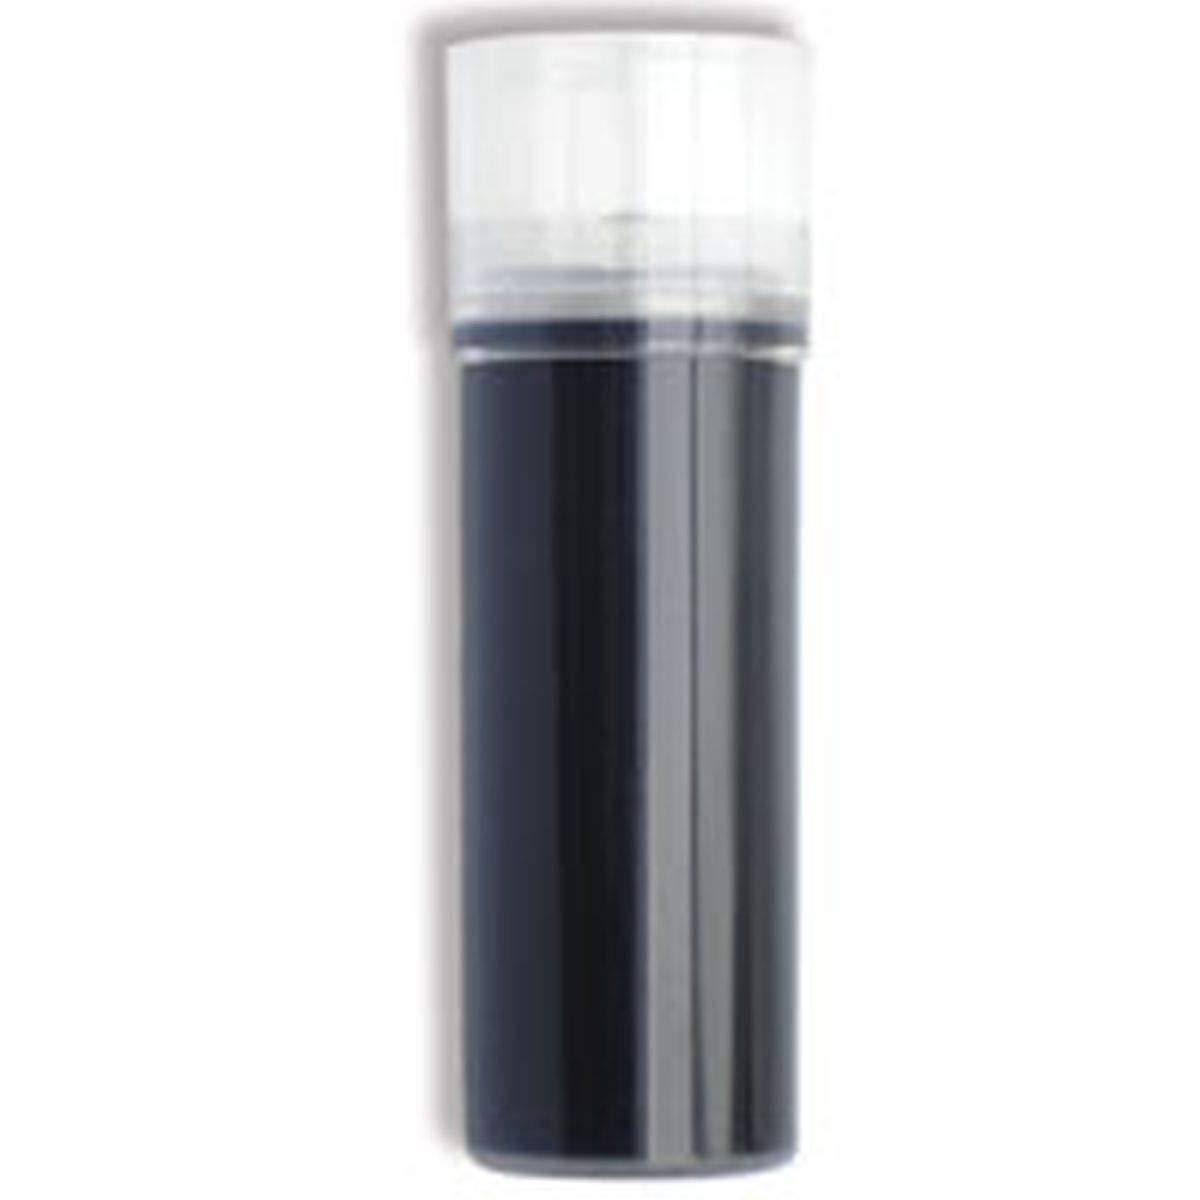 Pilot Refill for Begreen Recycled V Board Master Marker Bullet/Chisel Tip - Black, Box of 12